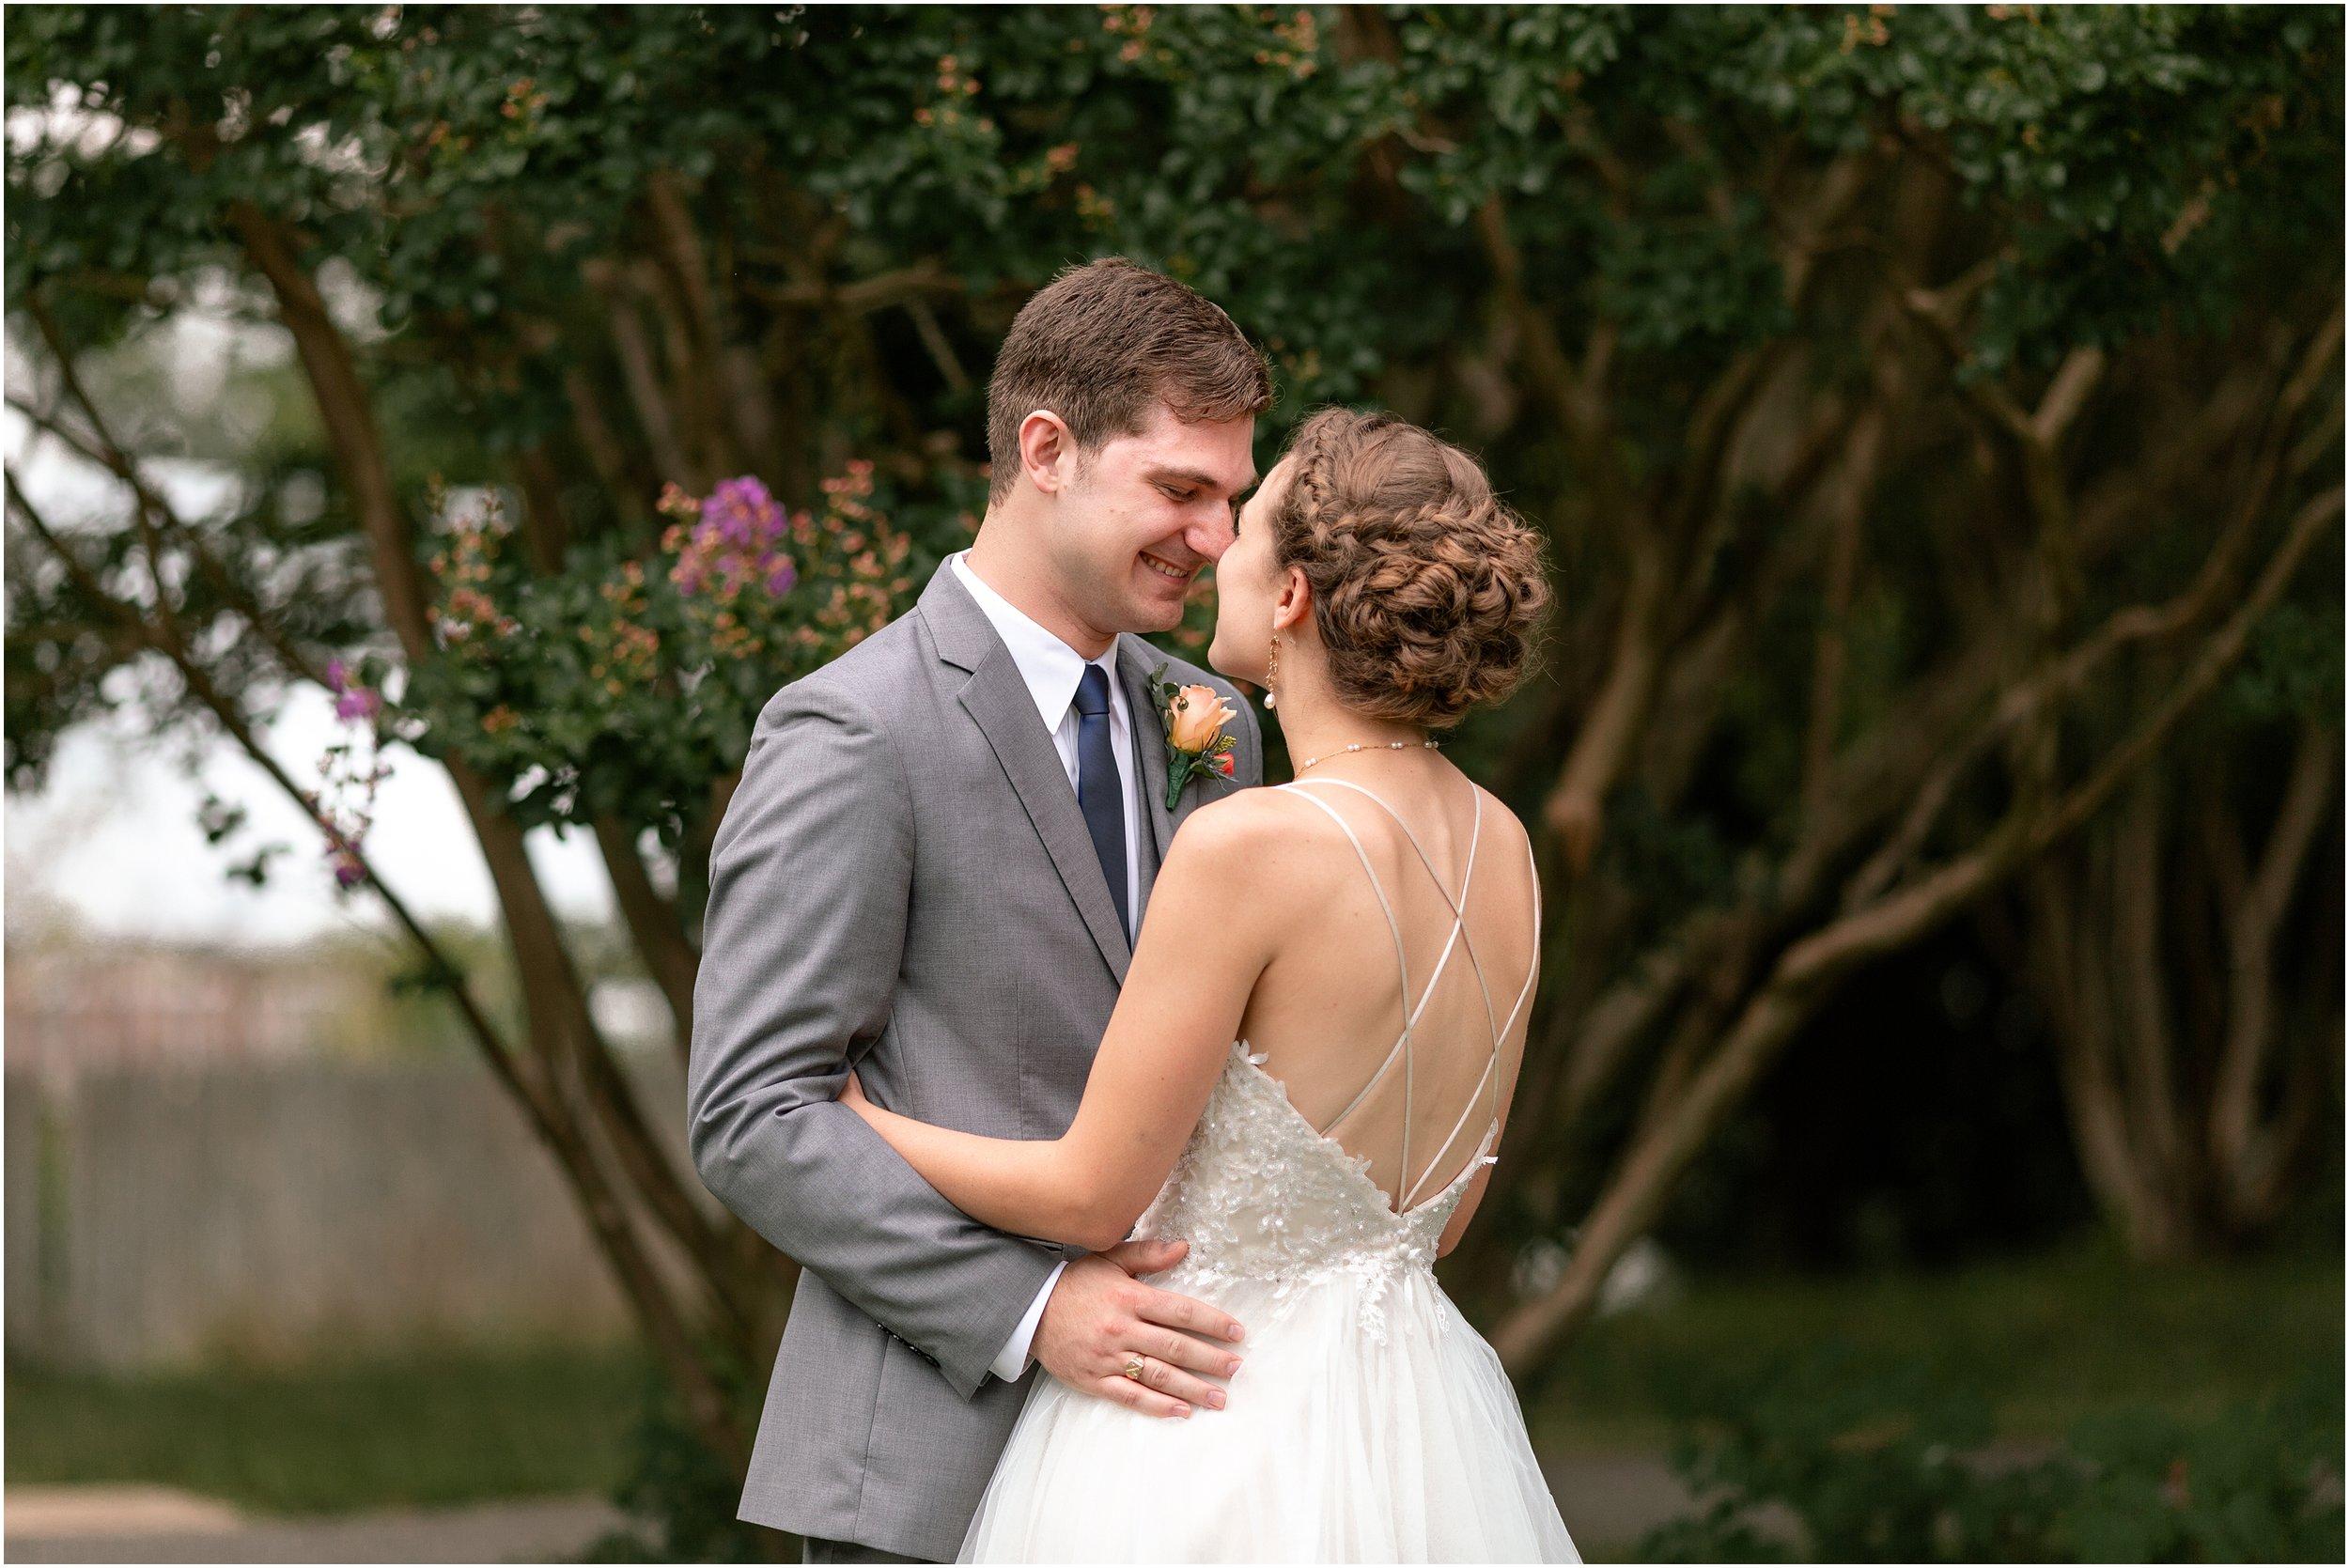 hannah leigh photography Cylburn Arboretum Wedding Baltimore, MD_3411.jpg